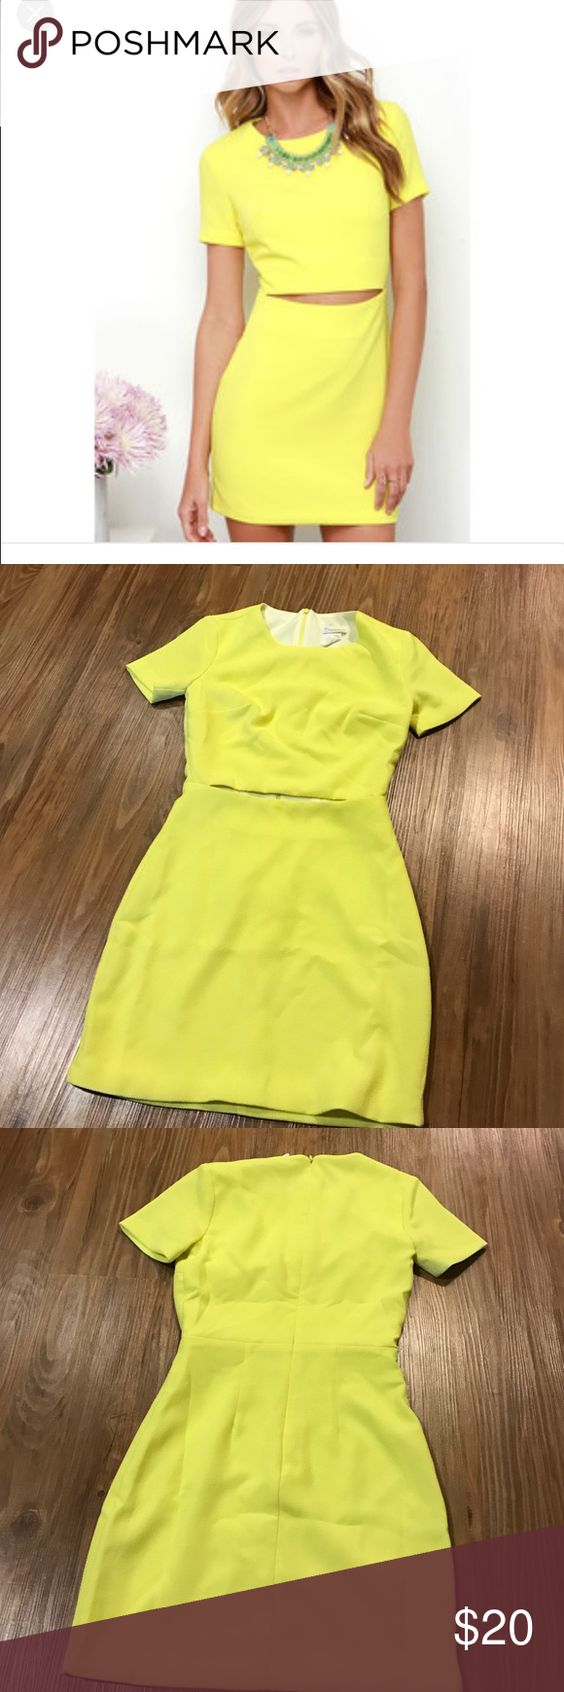 Yellow cocktail dress xs